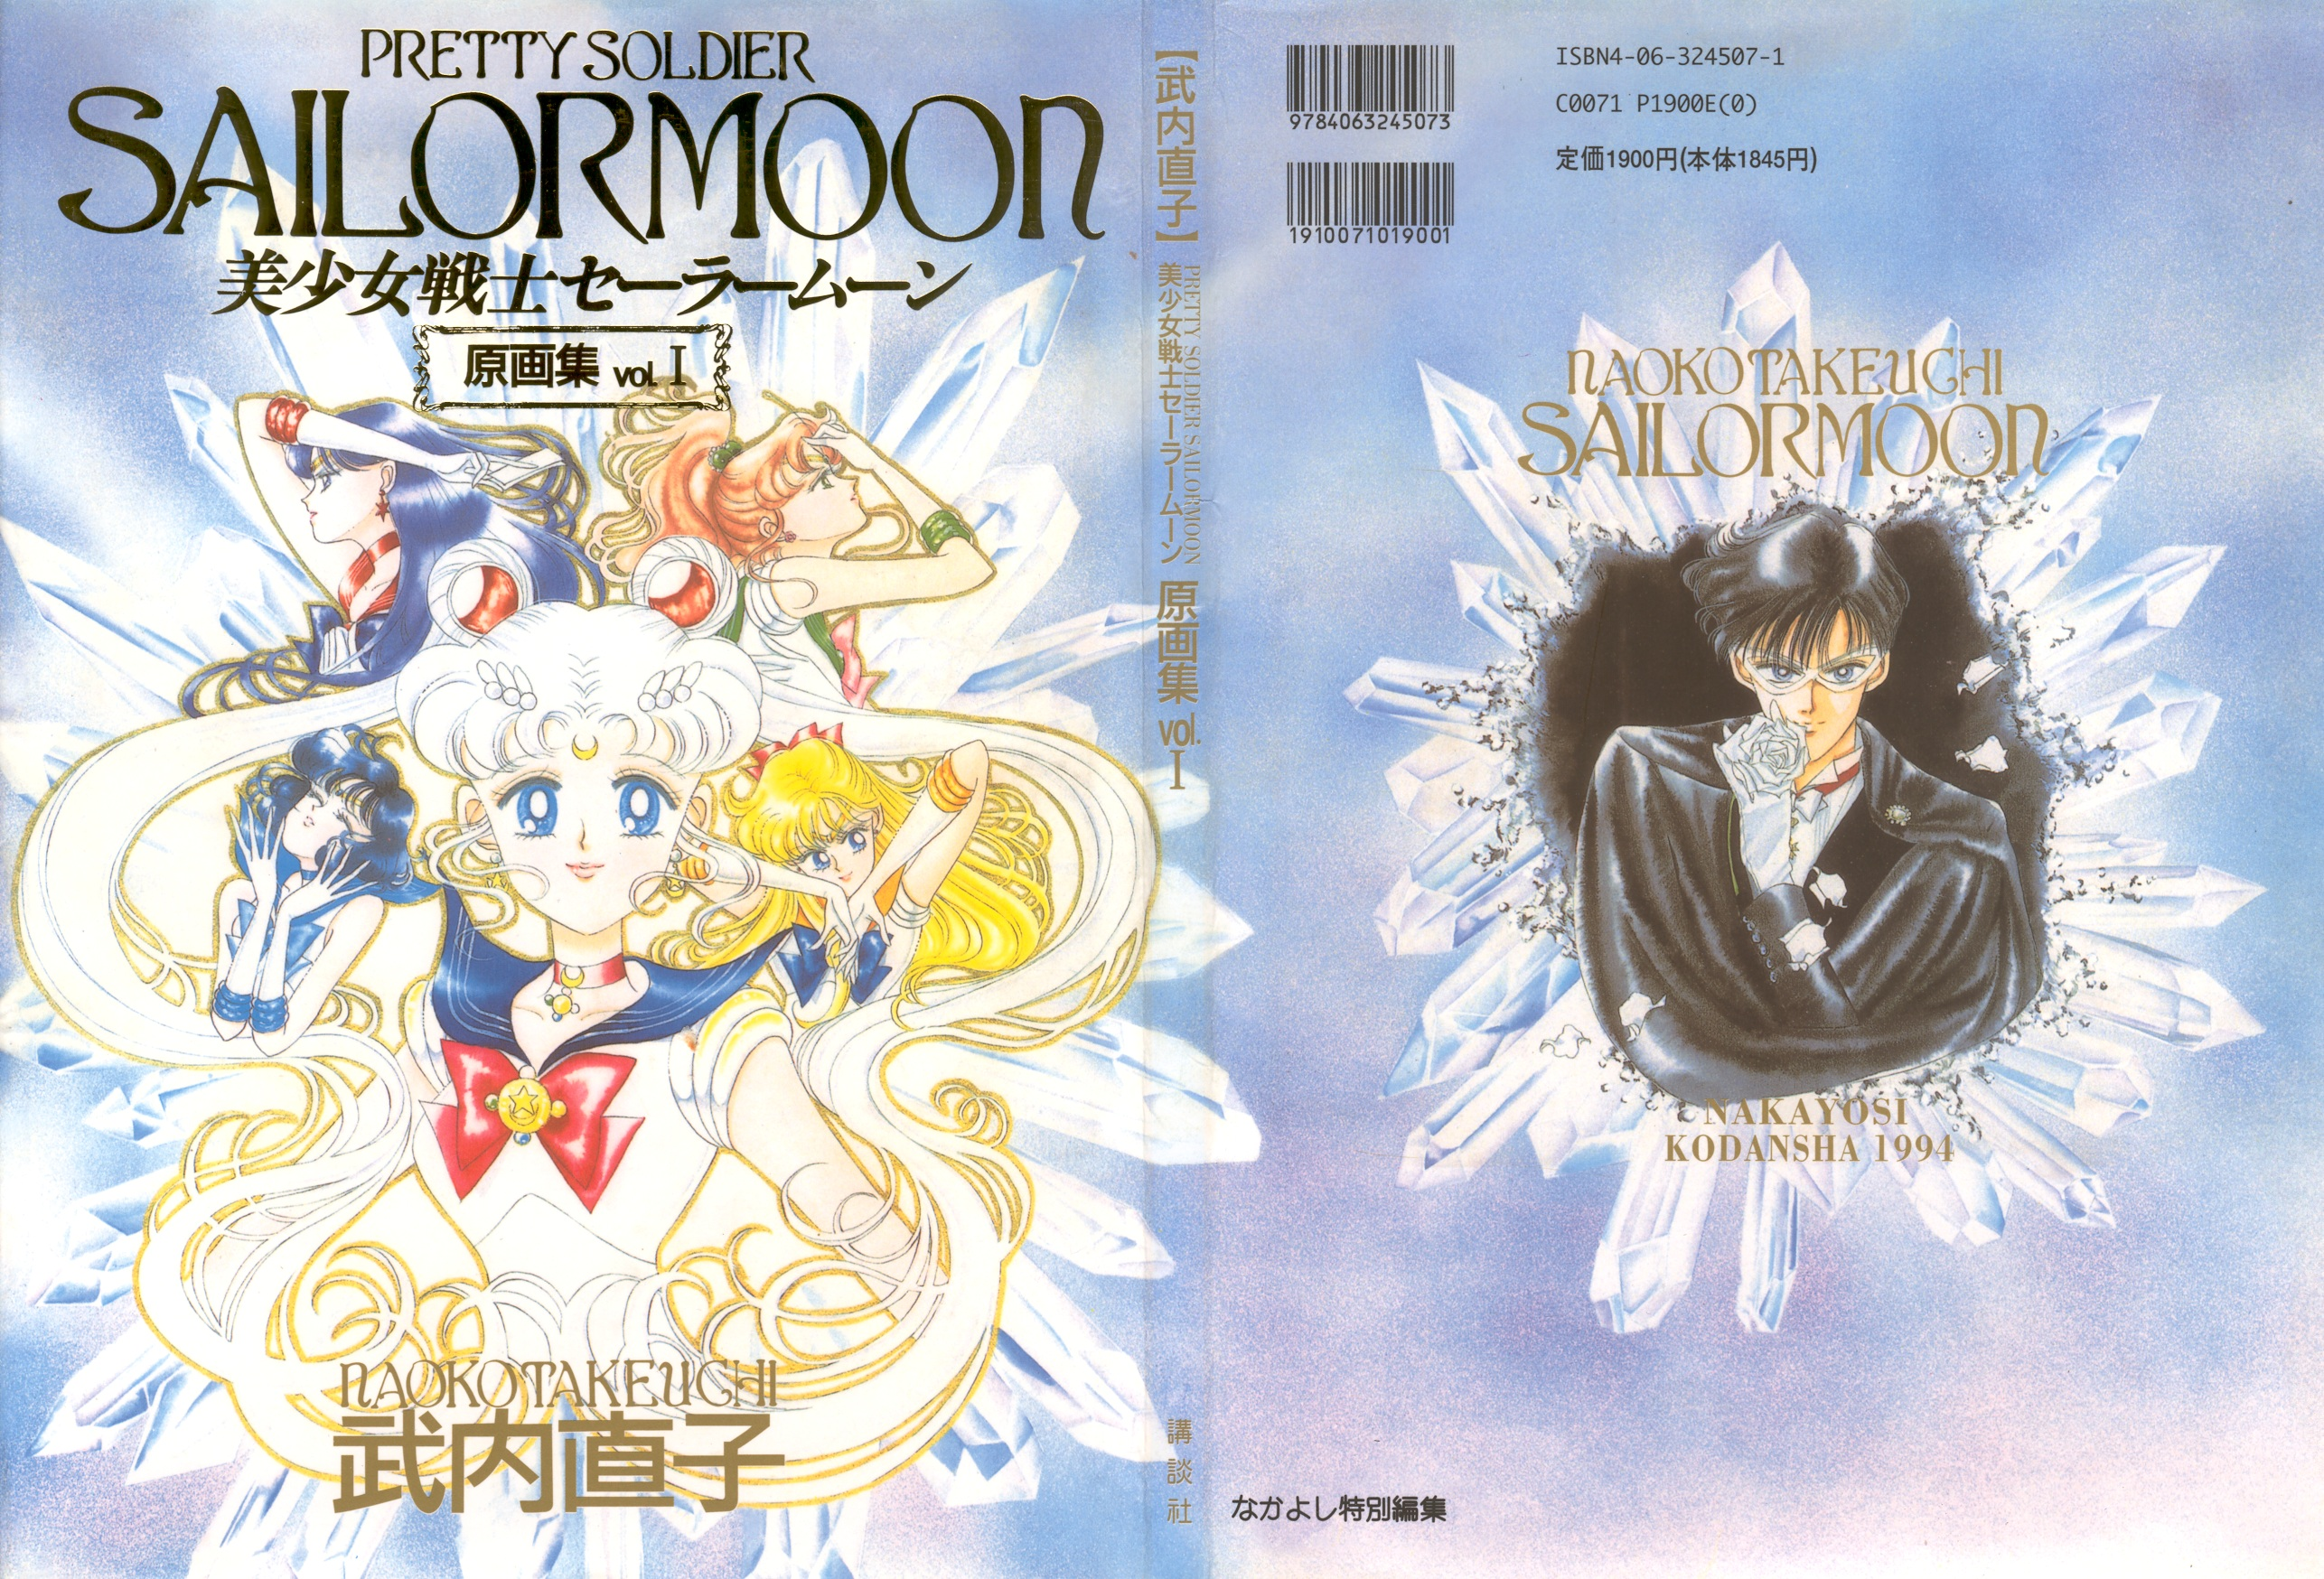 sailormoon-artbook-1-00